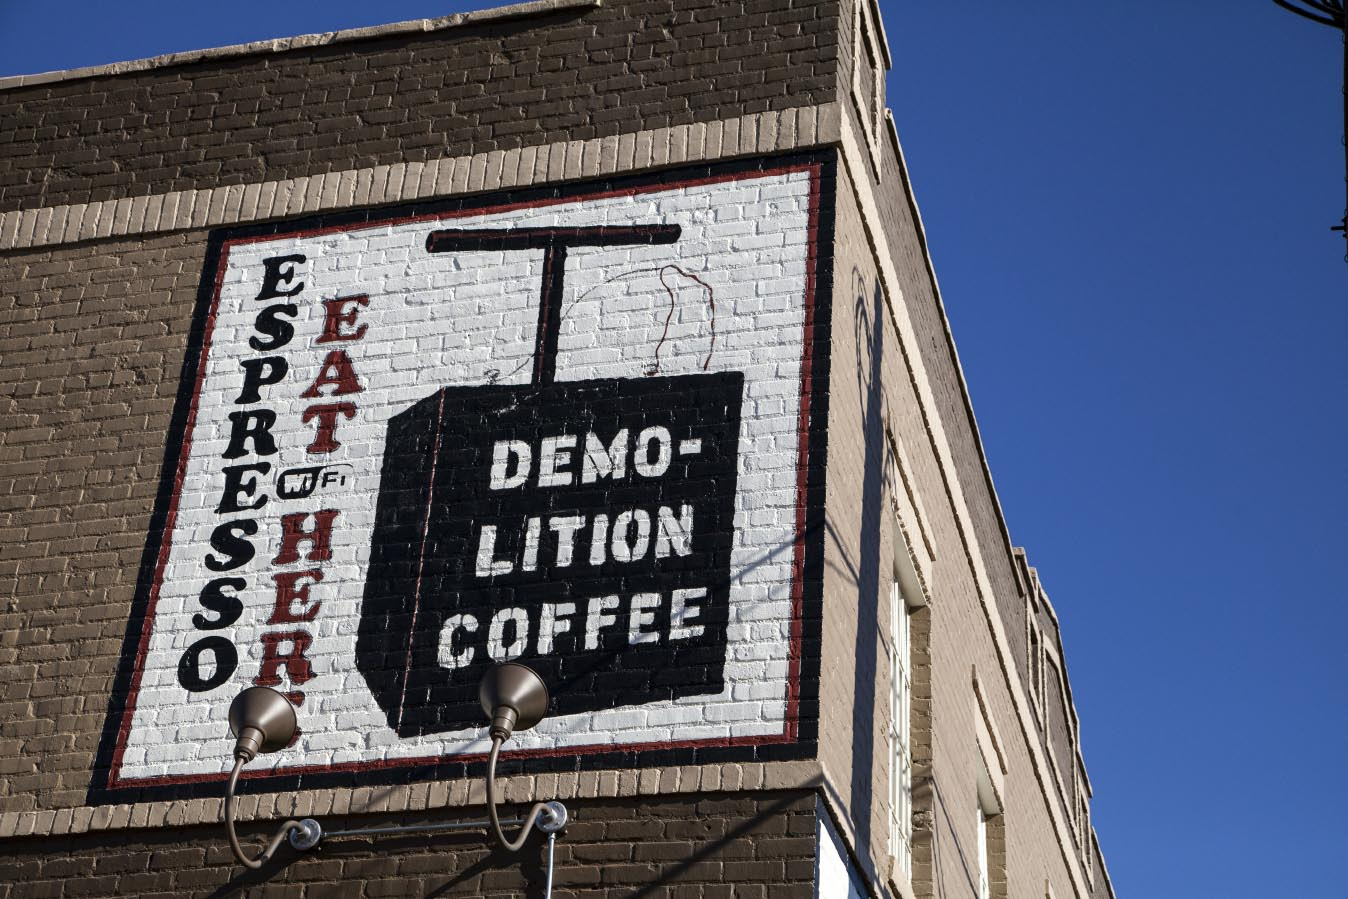 Demolition Coffee